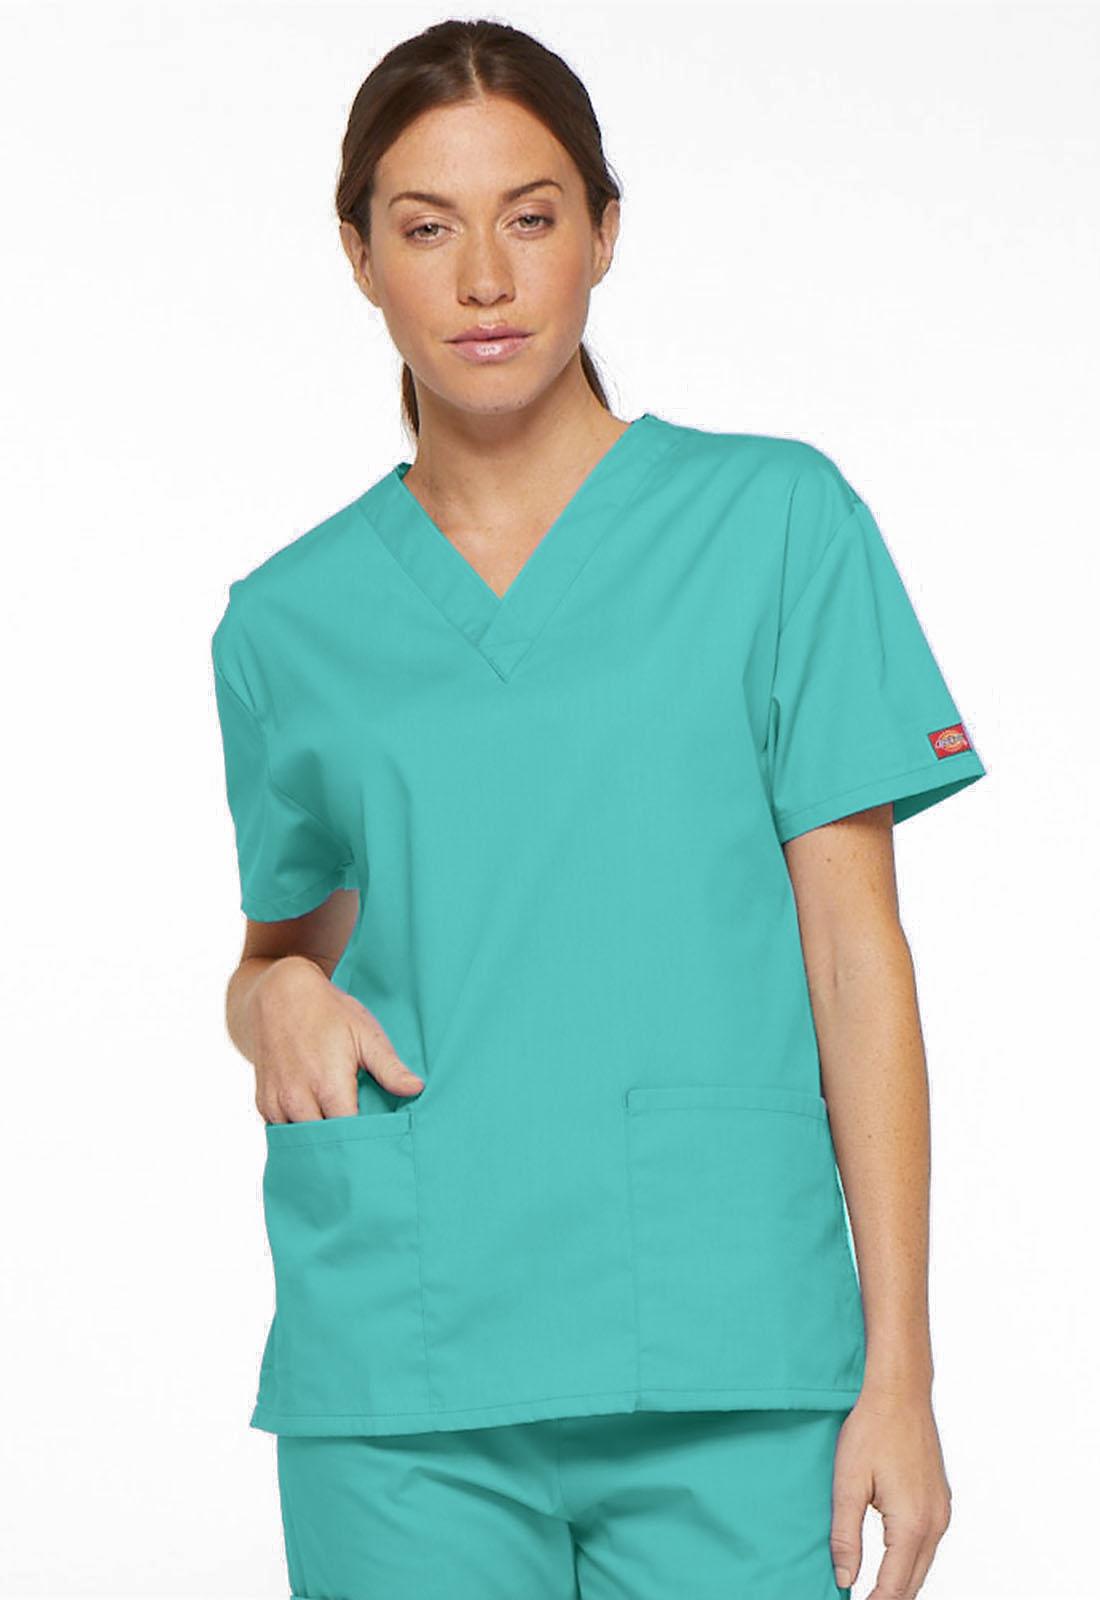 6dde24f14a6 Dickies EDS Signature V-Neck Top 86706-LGON from James Medical Uniforms